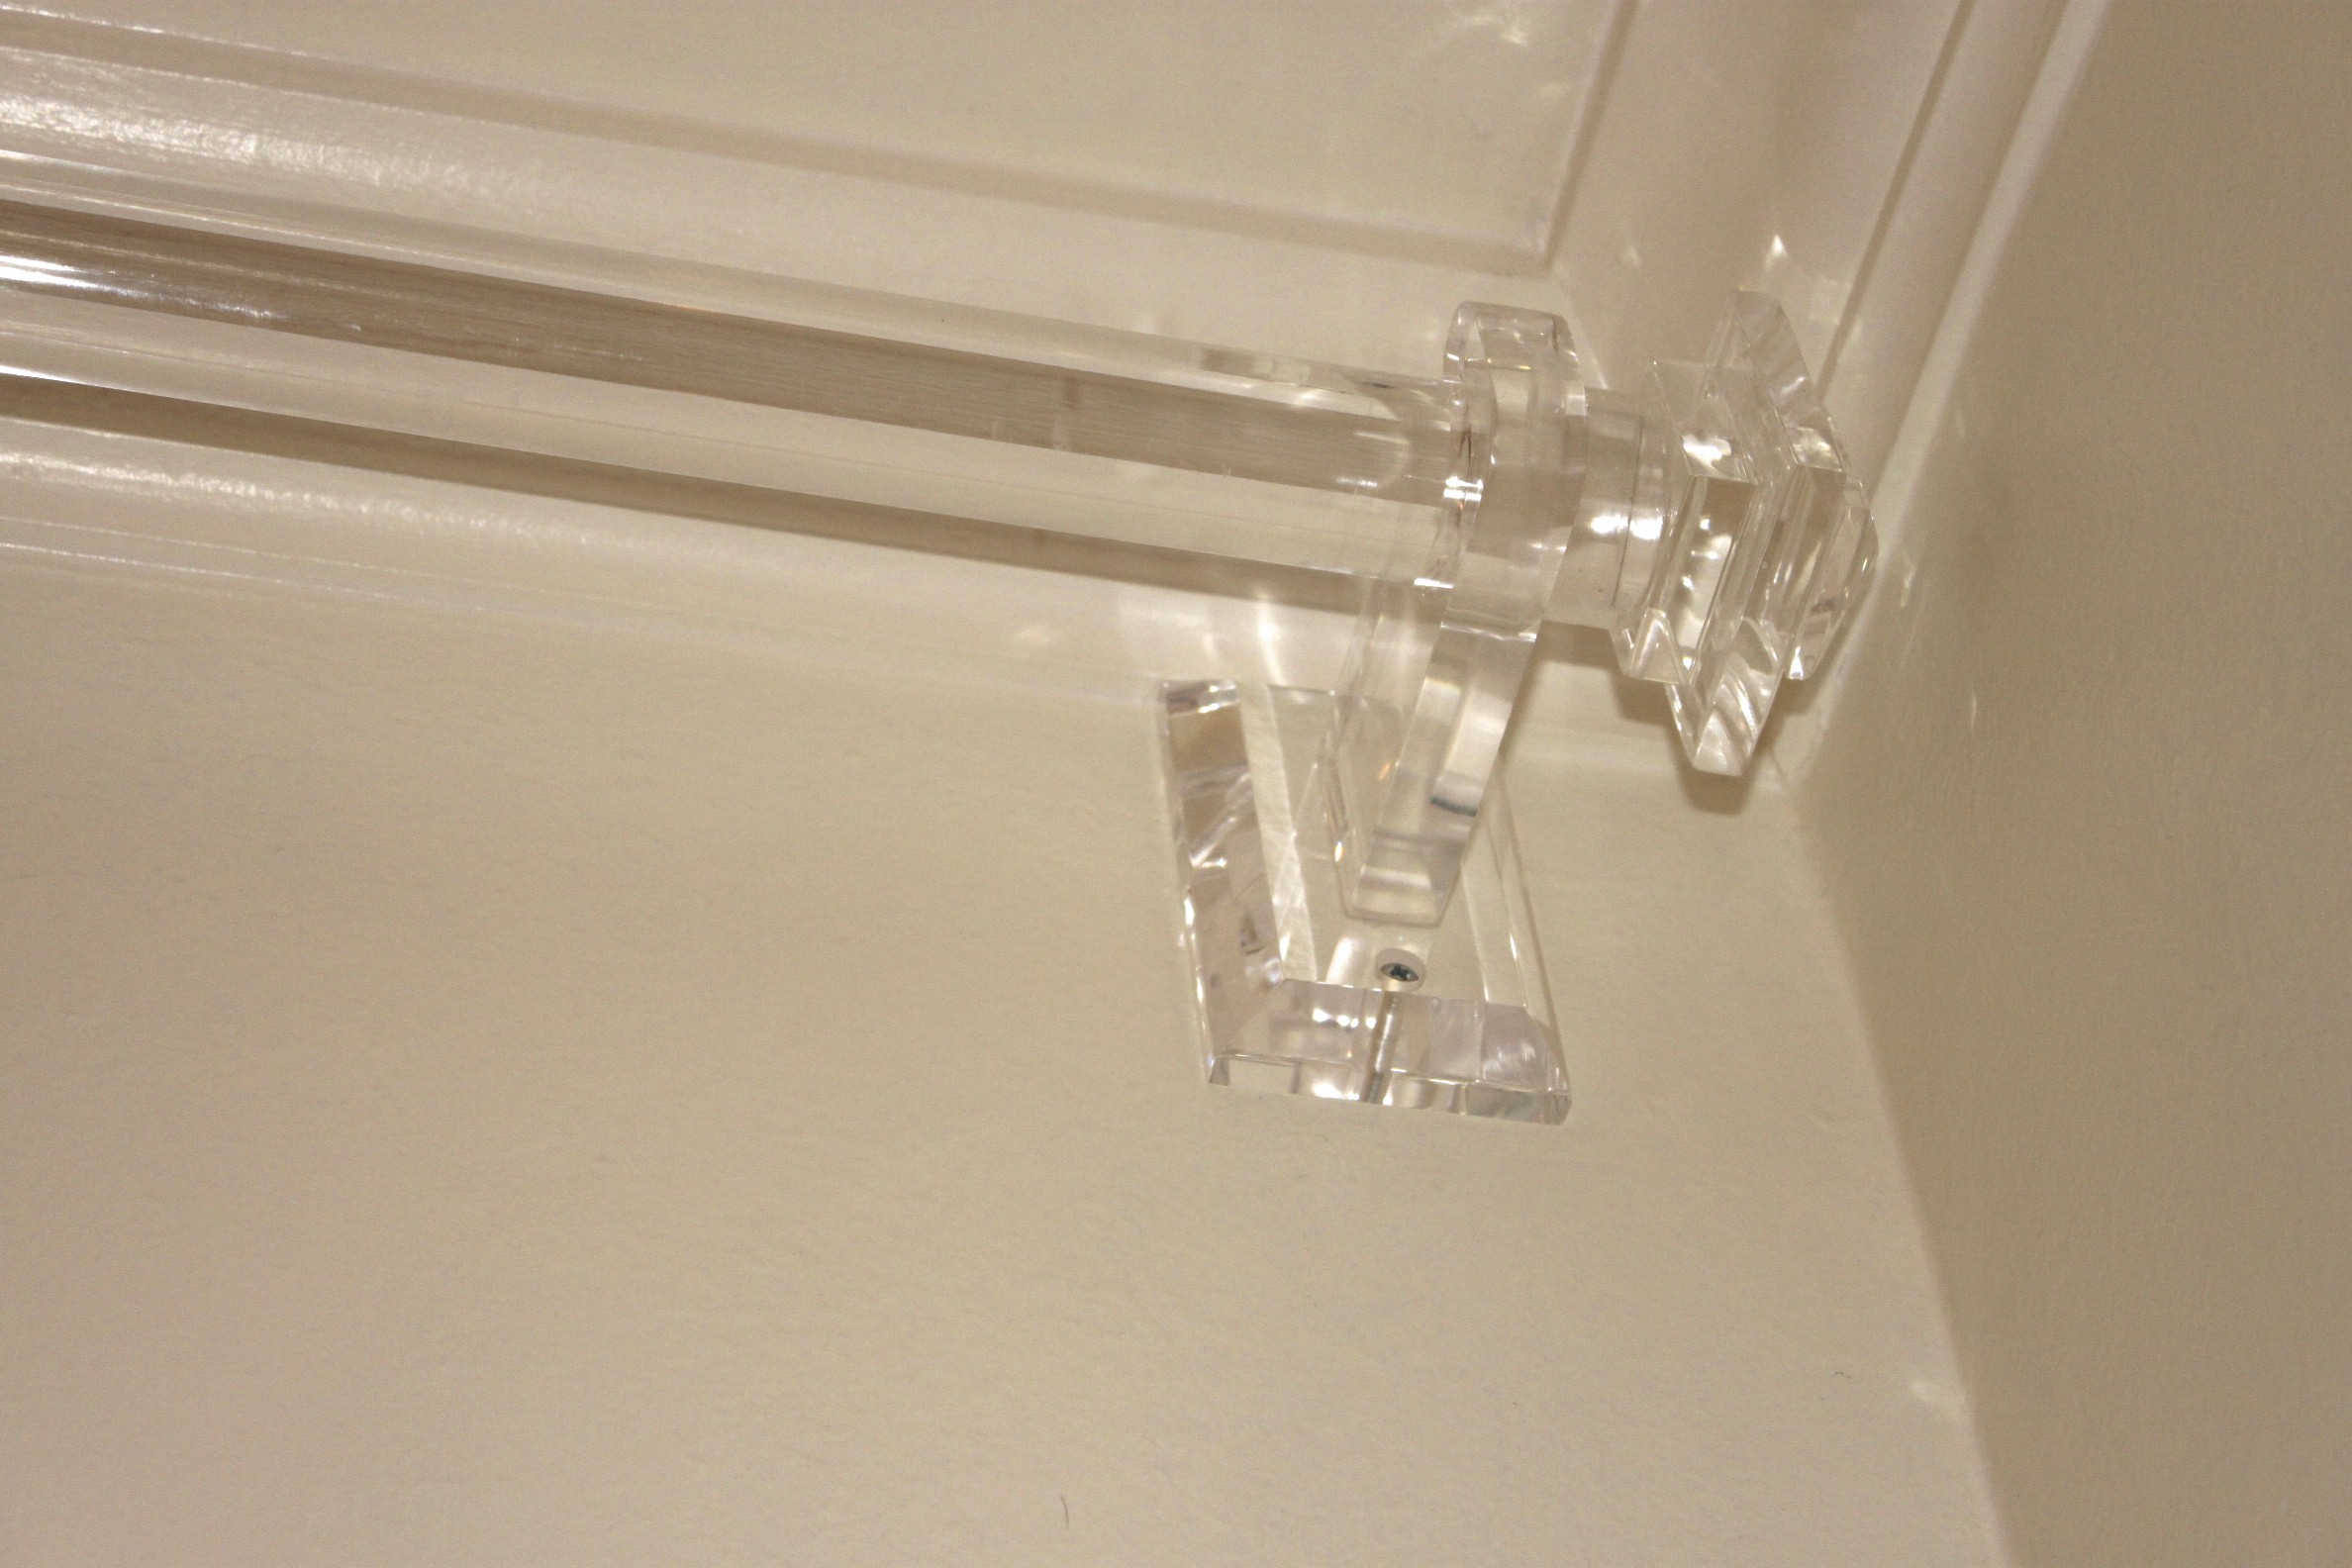 Acrylic curtain rod - Plexi Craft Acrylic Rod Finial Bracket